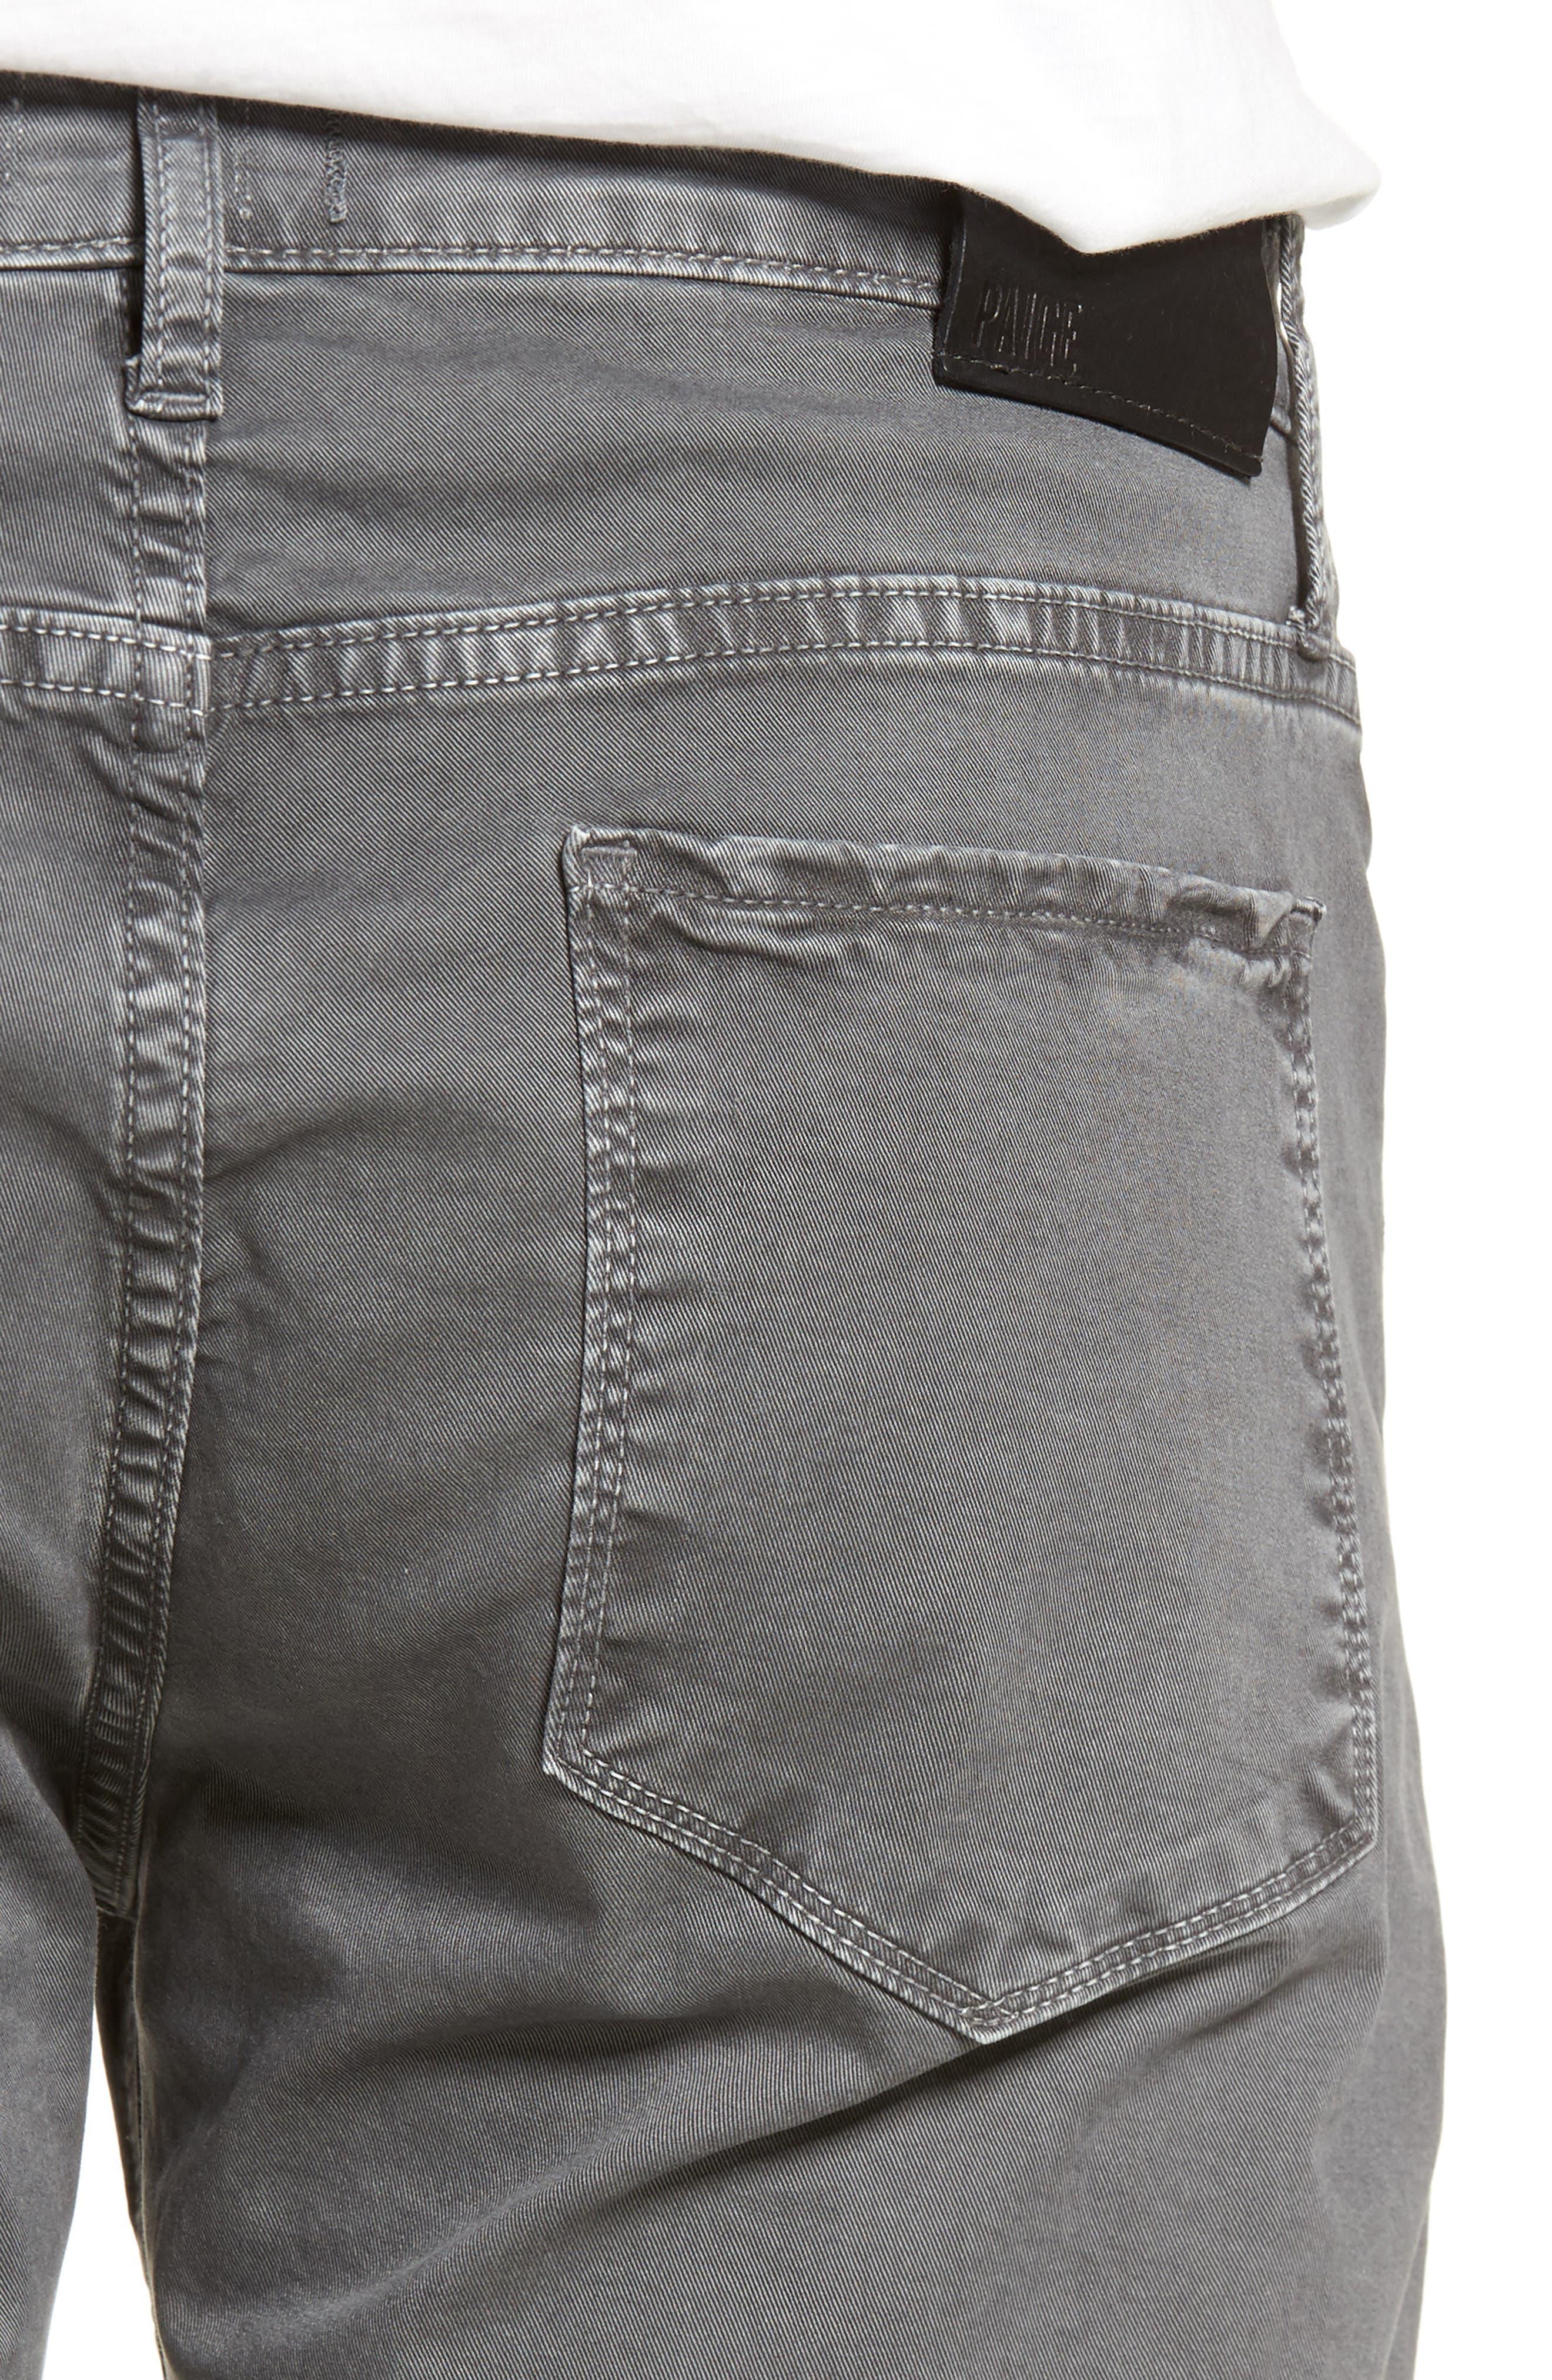 Lennox Slim Fit Five-Pocket Pants,                             Alternate thumbnail 4, color,                             VINTAGE THUNDER GREY